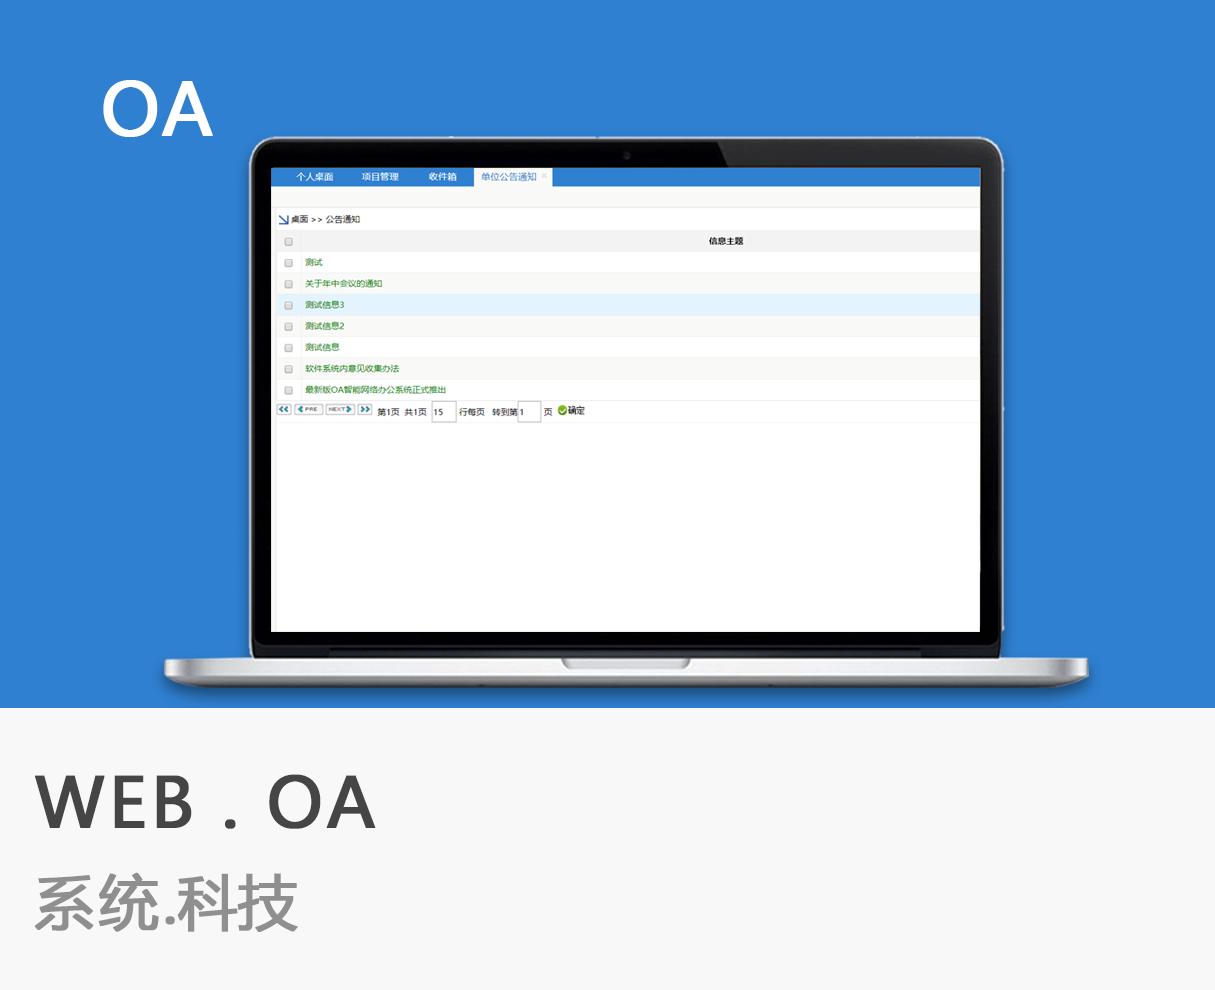 OA系统|软件开发|企业管理|销售企业|erp|苏州|信息化